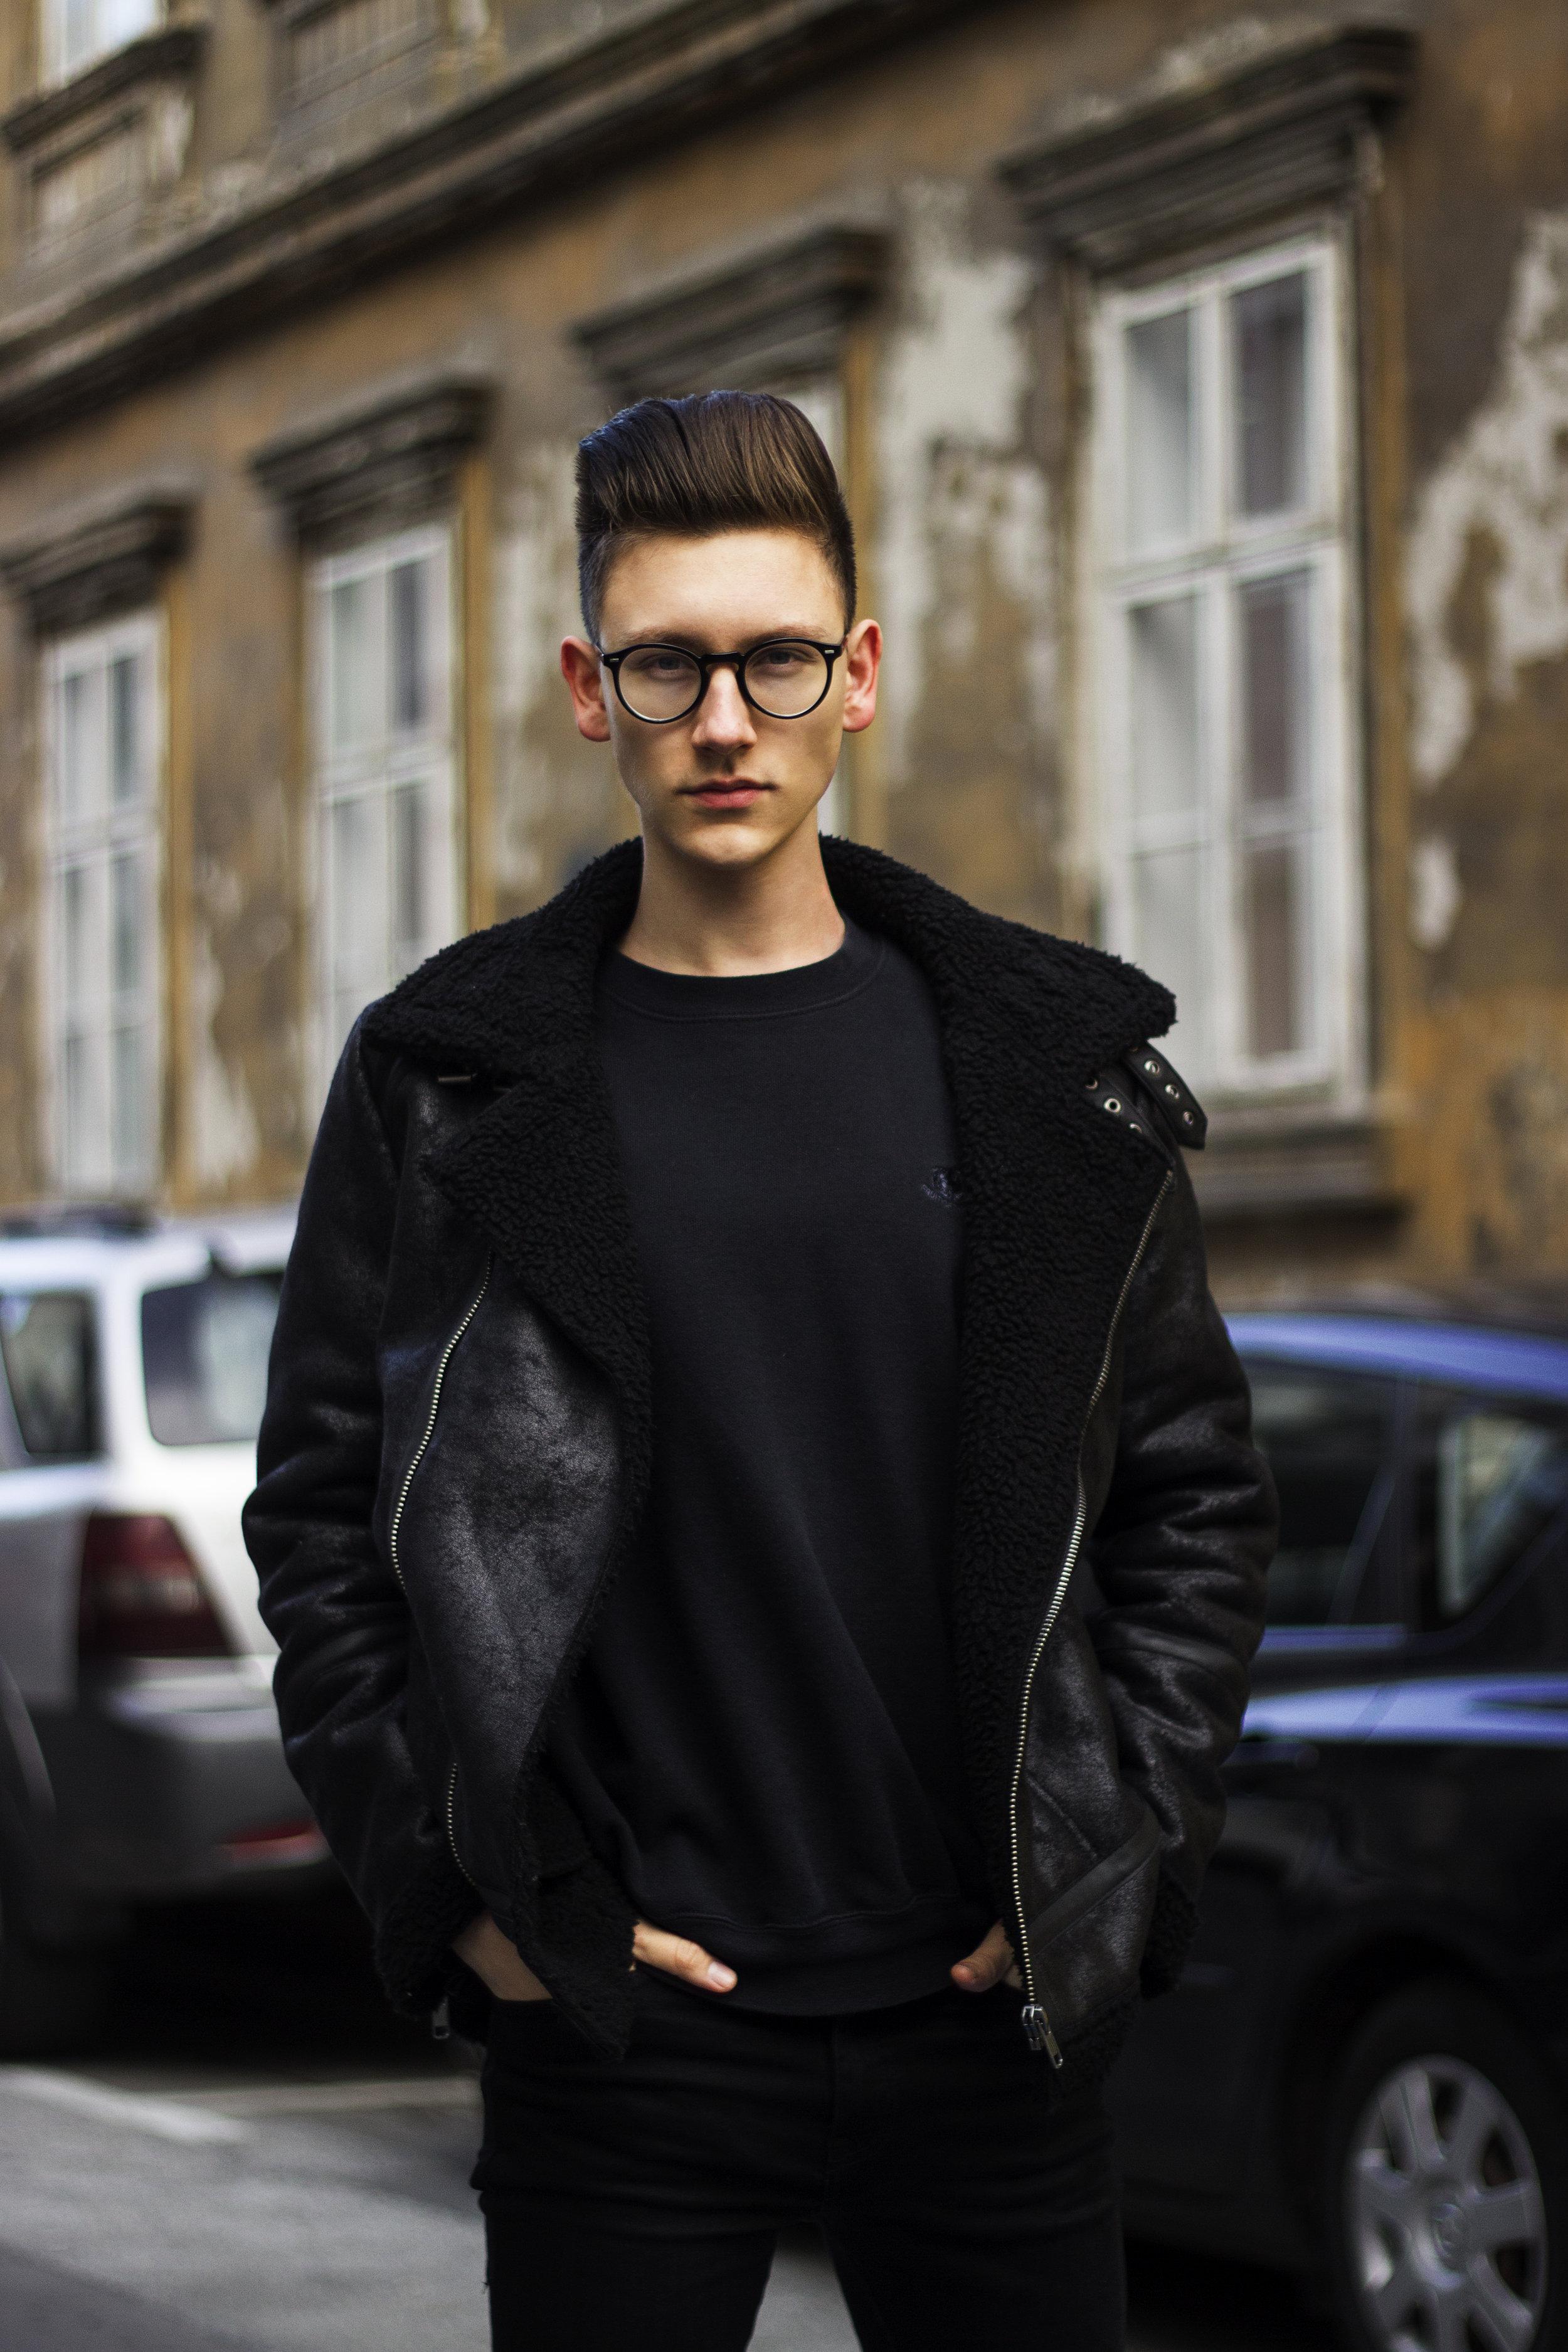 luka-lajic-expensive-reality-hm-mens-fashion-croatia-blogger.jpg